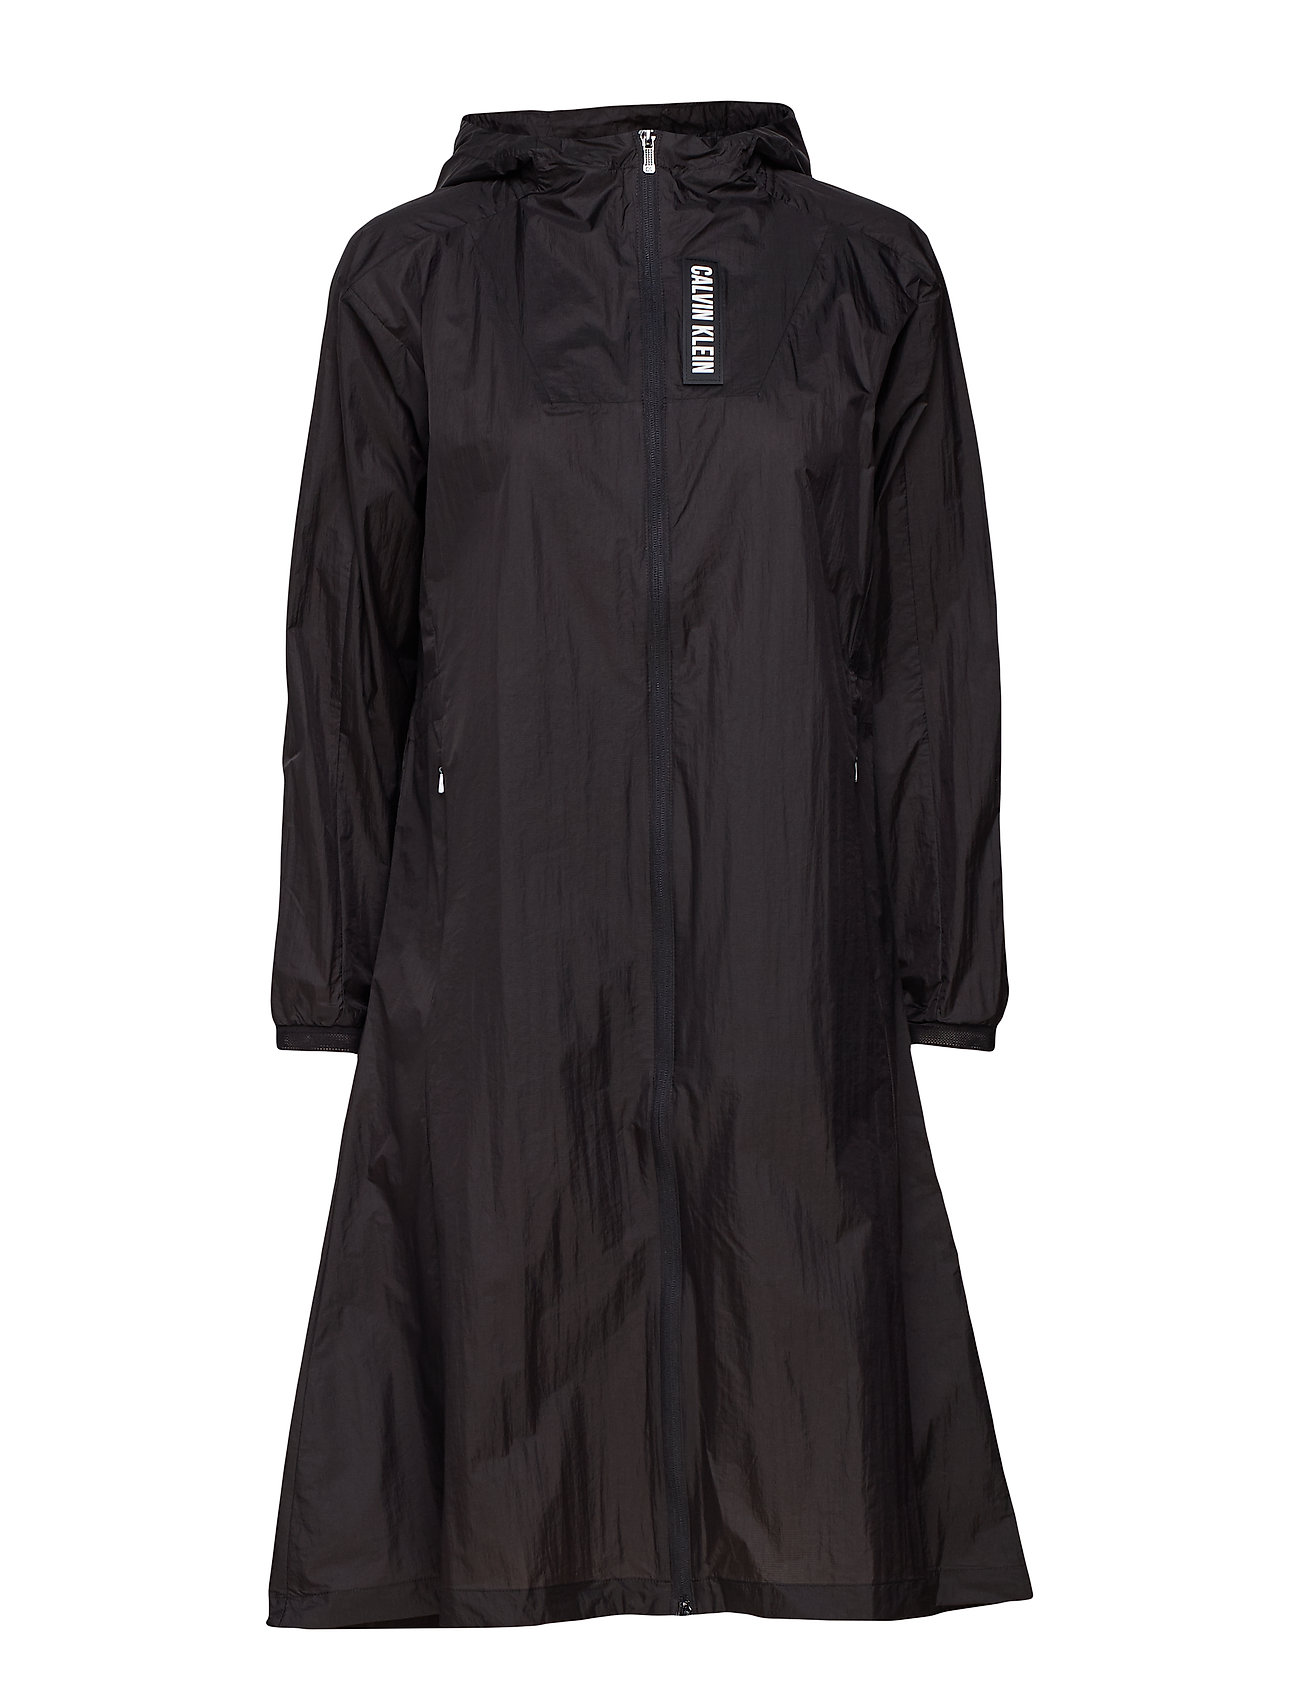 Calvin Klein Performance LW COAT - CK BLACK